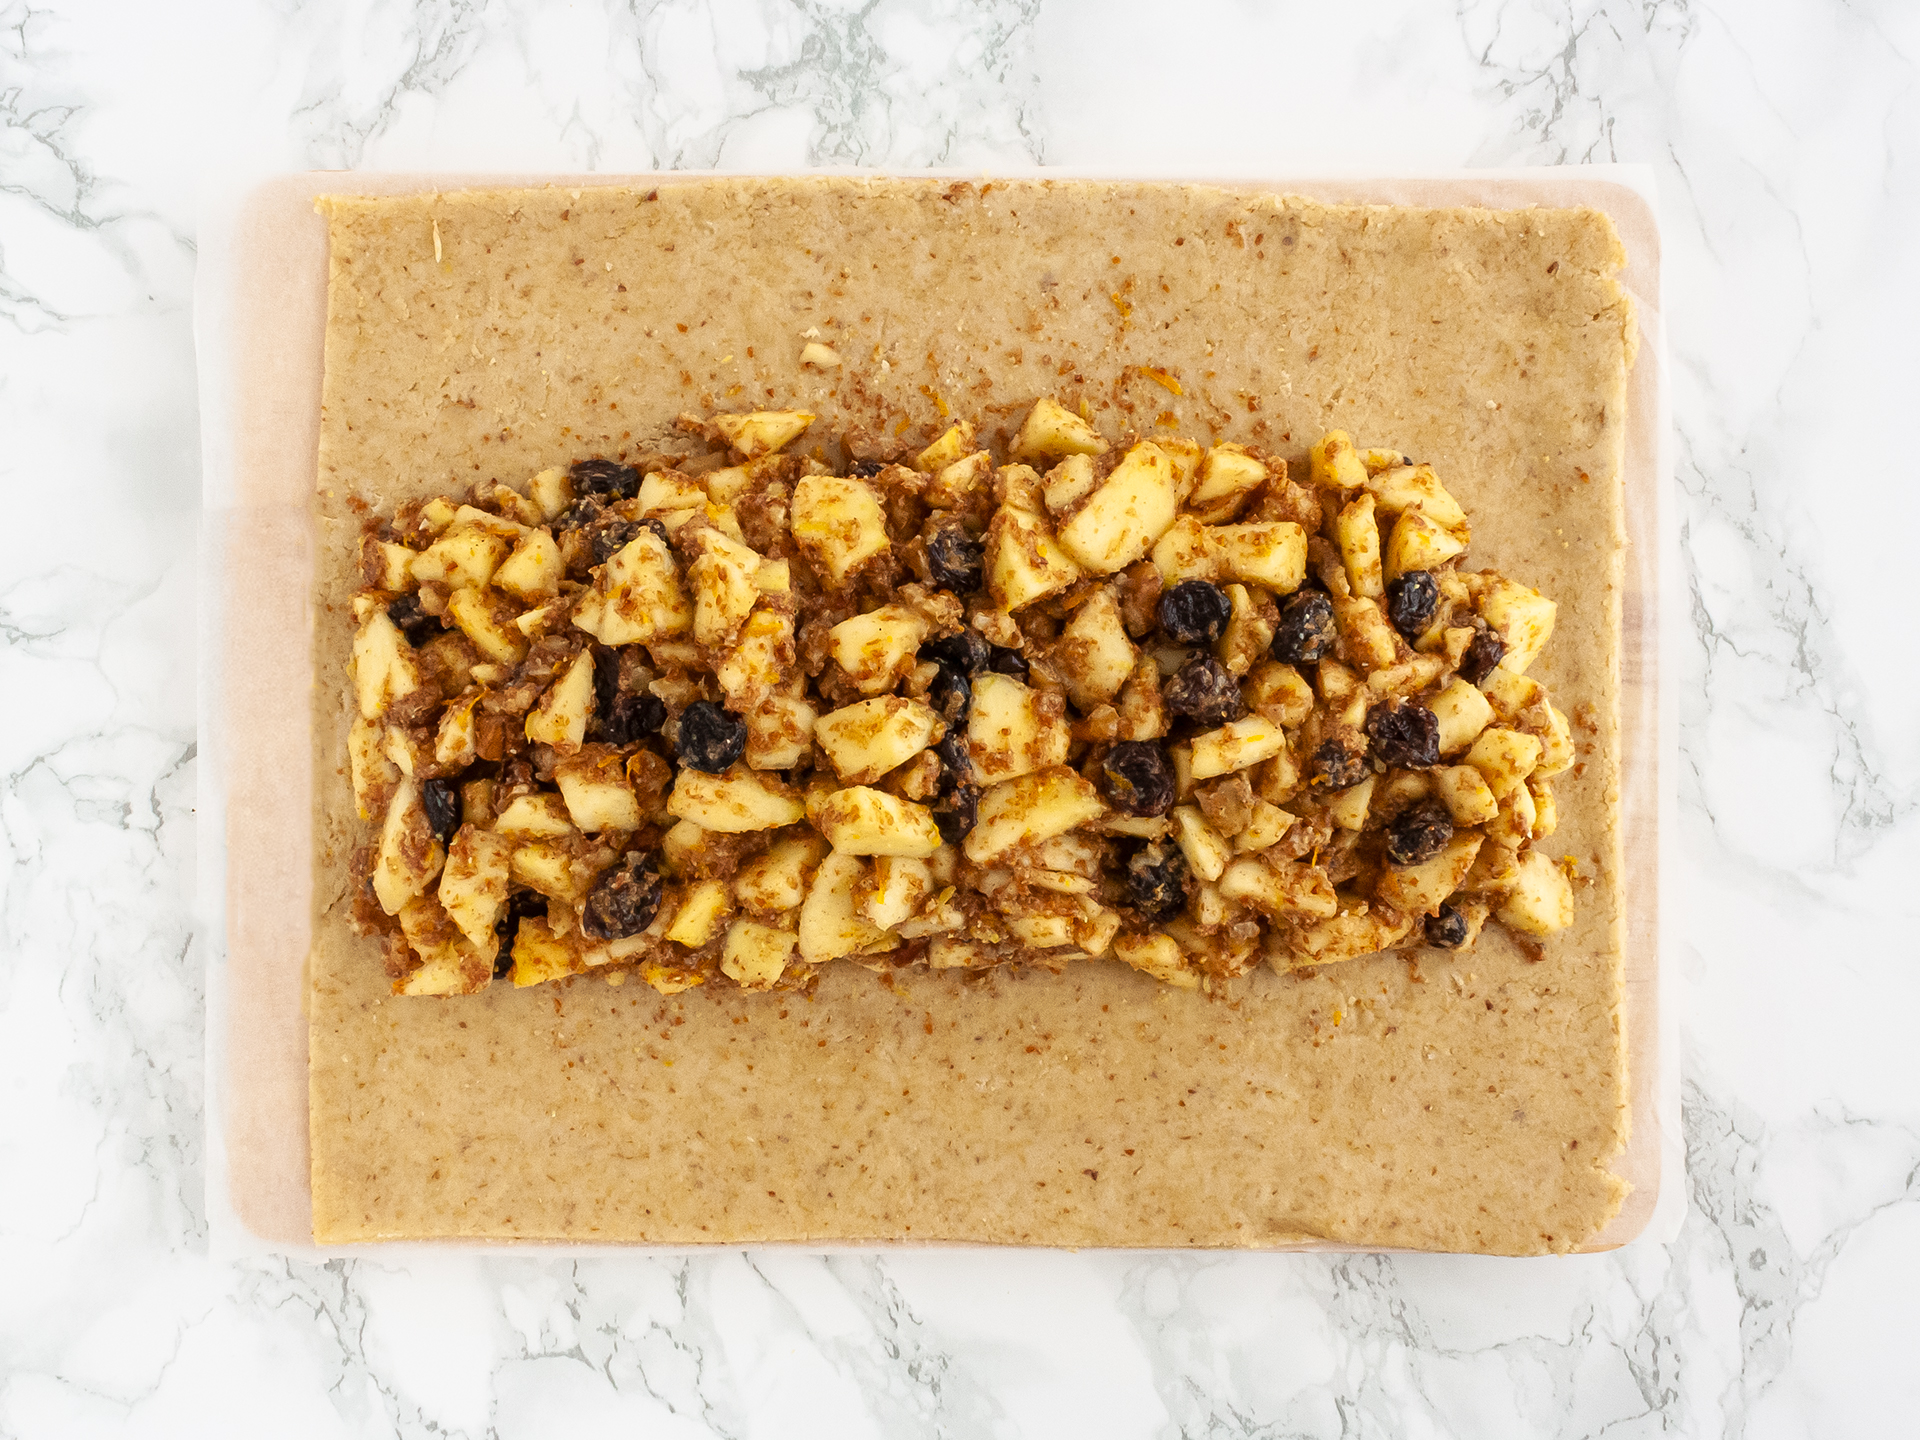 Step 3.1 of Gluten Free Apple Strudel Recipe